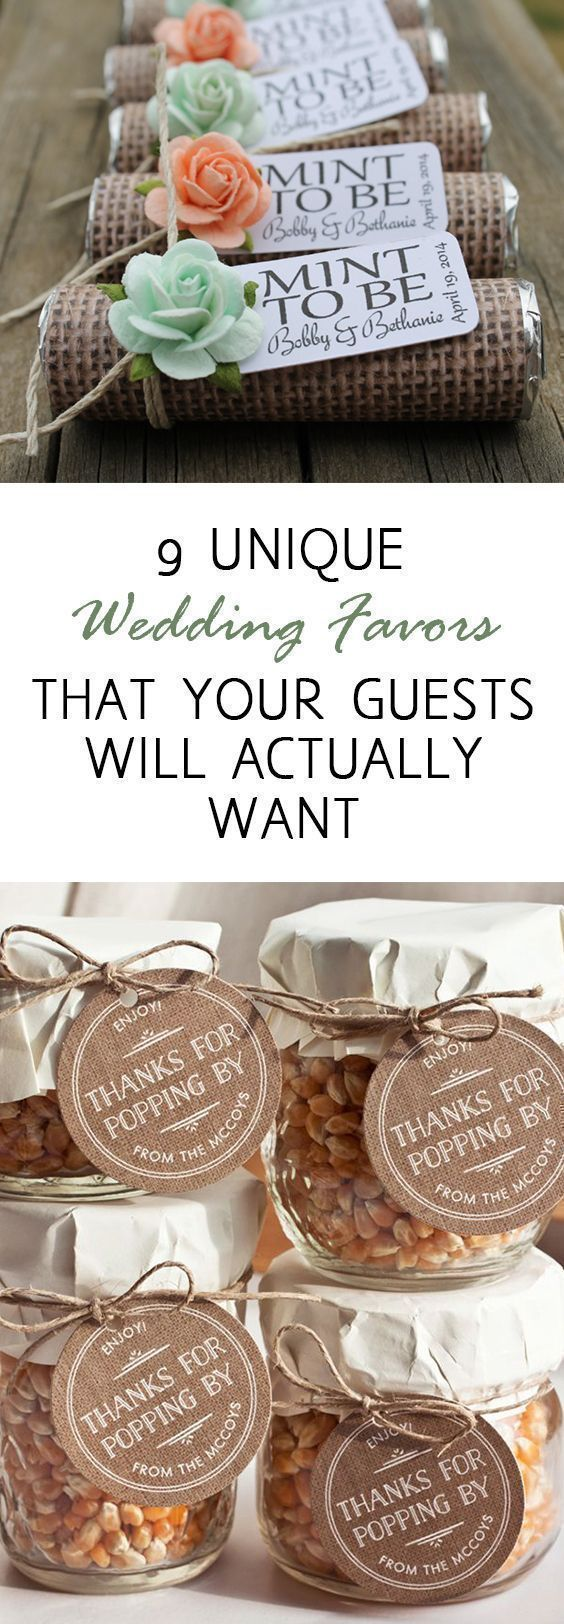 7 best try it images on Pinterest | Wedding souvenir, Wedding ...